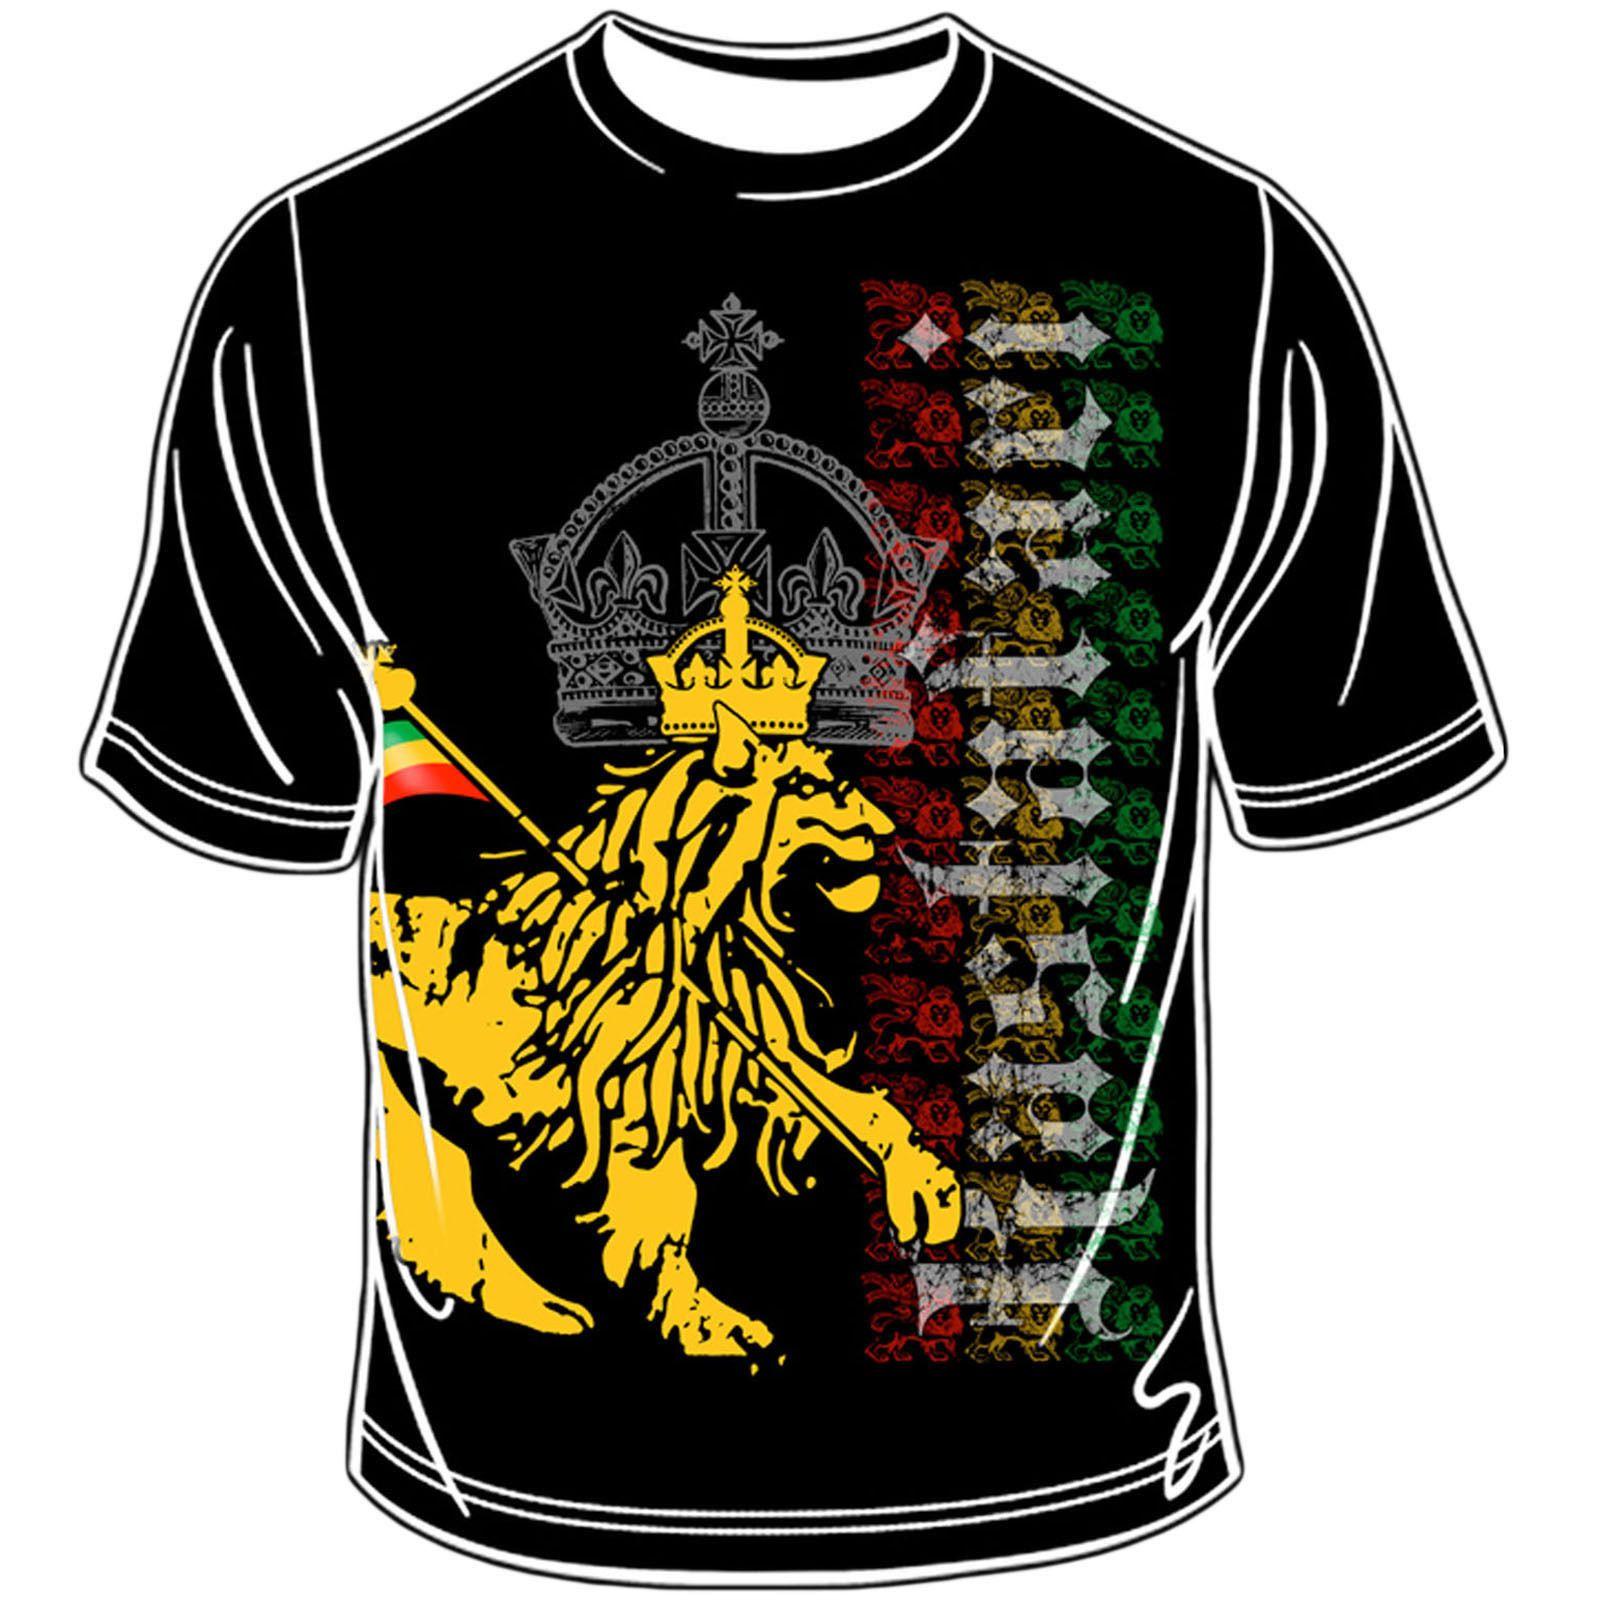 Design t shirt reggae - Details About Rastafari Lion Of Judah Rasta T Shirt Reggae Jamaica Marley Selassie Africa Lion